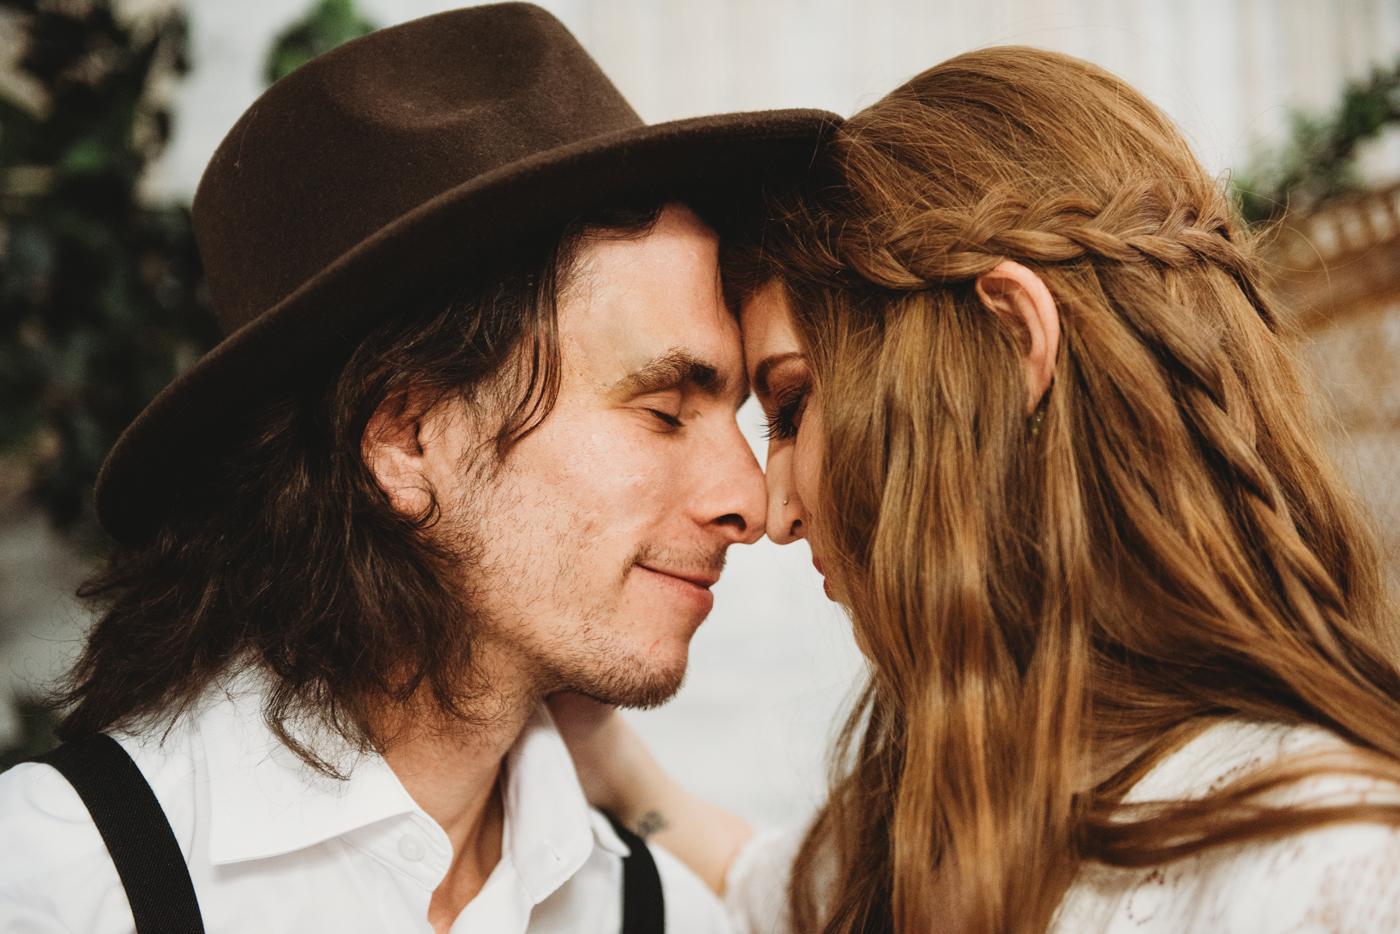 FortSt.John_photographer_TyraEPhotography_Wedding_Couple_Family_Photograhy_DawsonCreek_Elopement_Bride_Boduoir_Portraits-4835.jpg